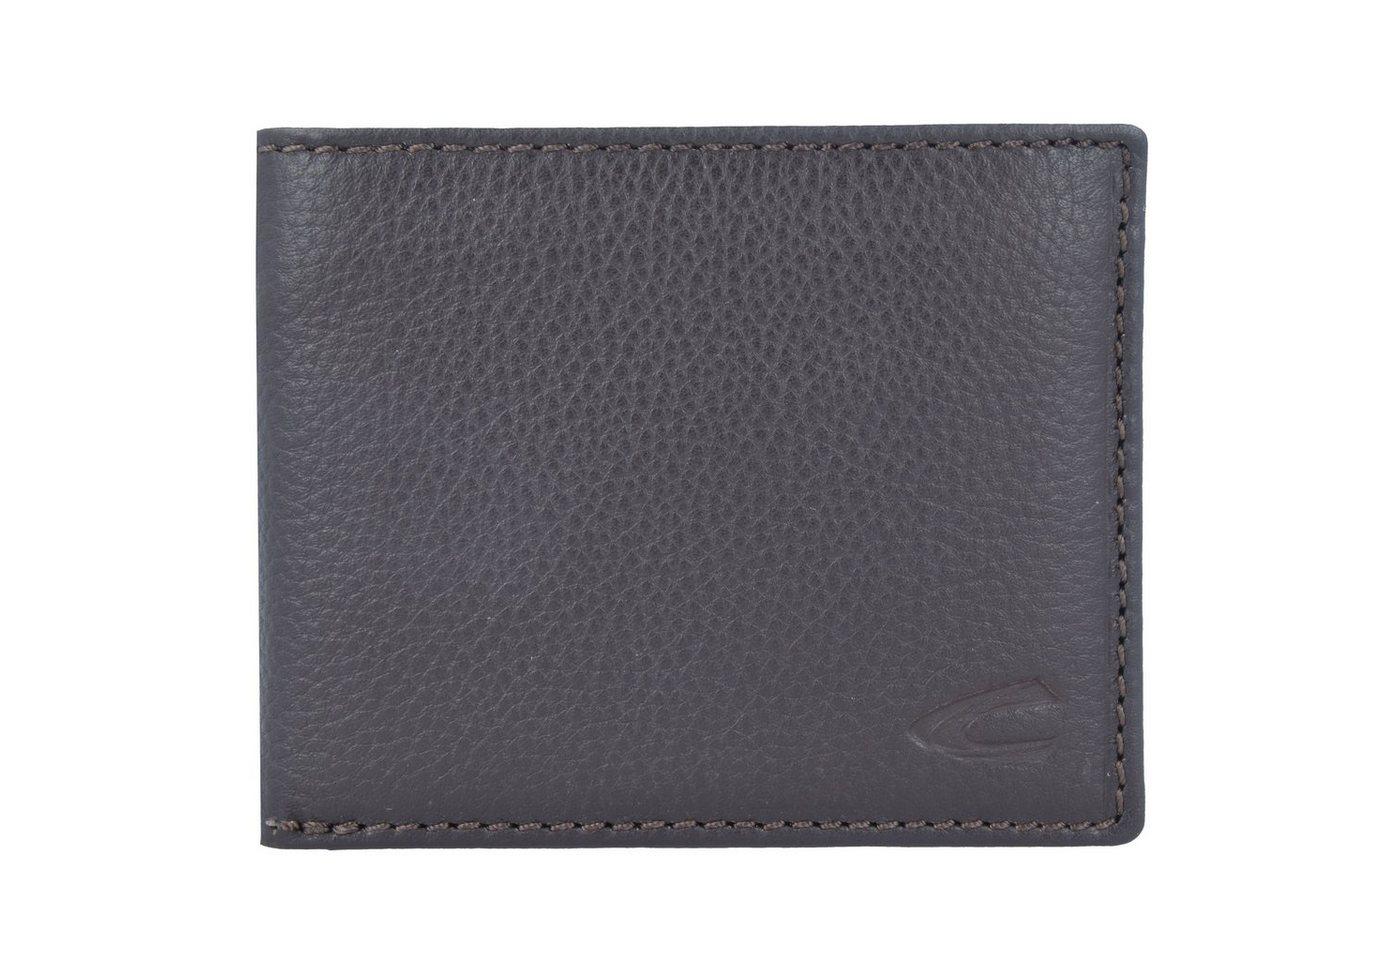 Herren camel active Macau Geldbörse RFID Leder 10 cm braun | 04251234436158